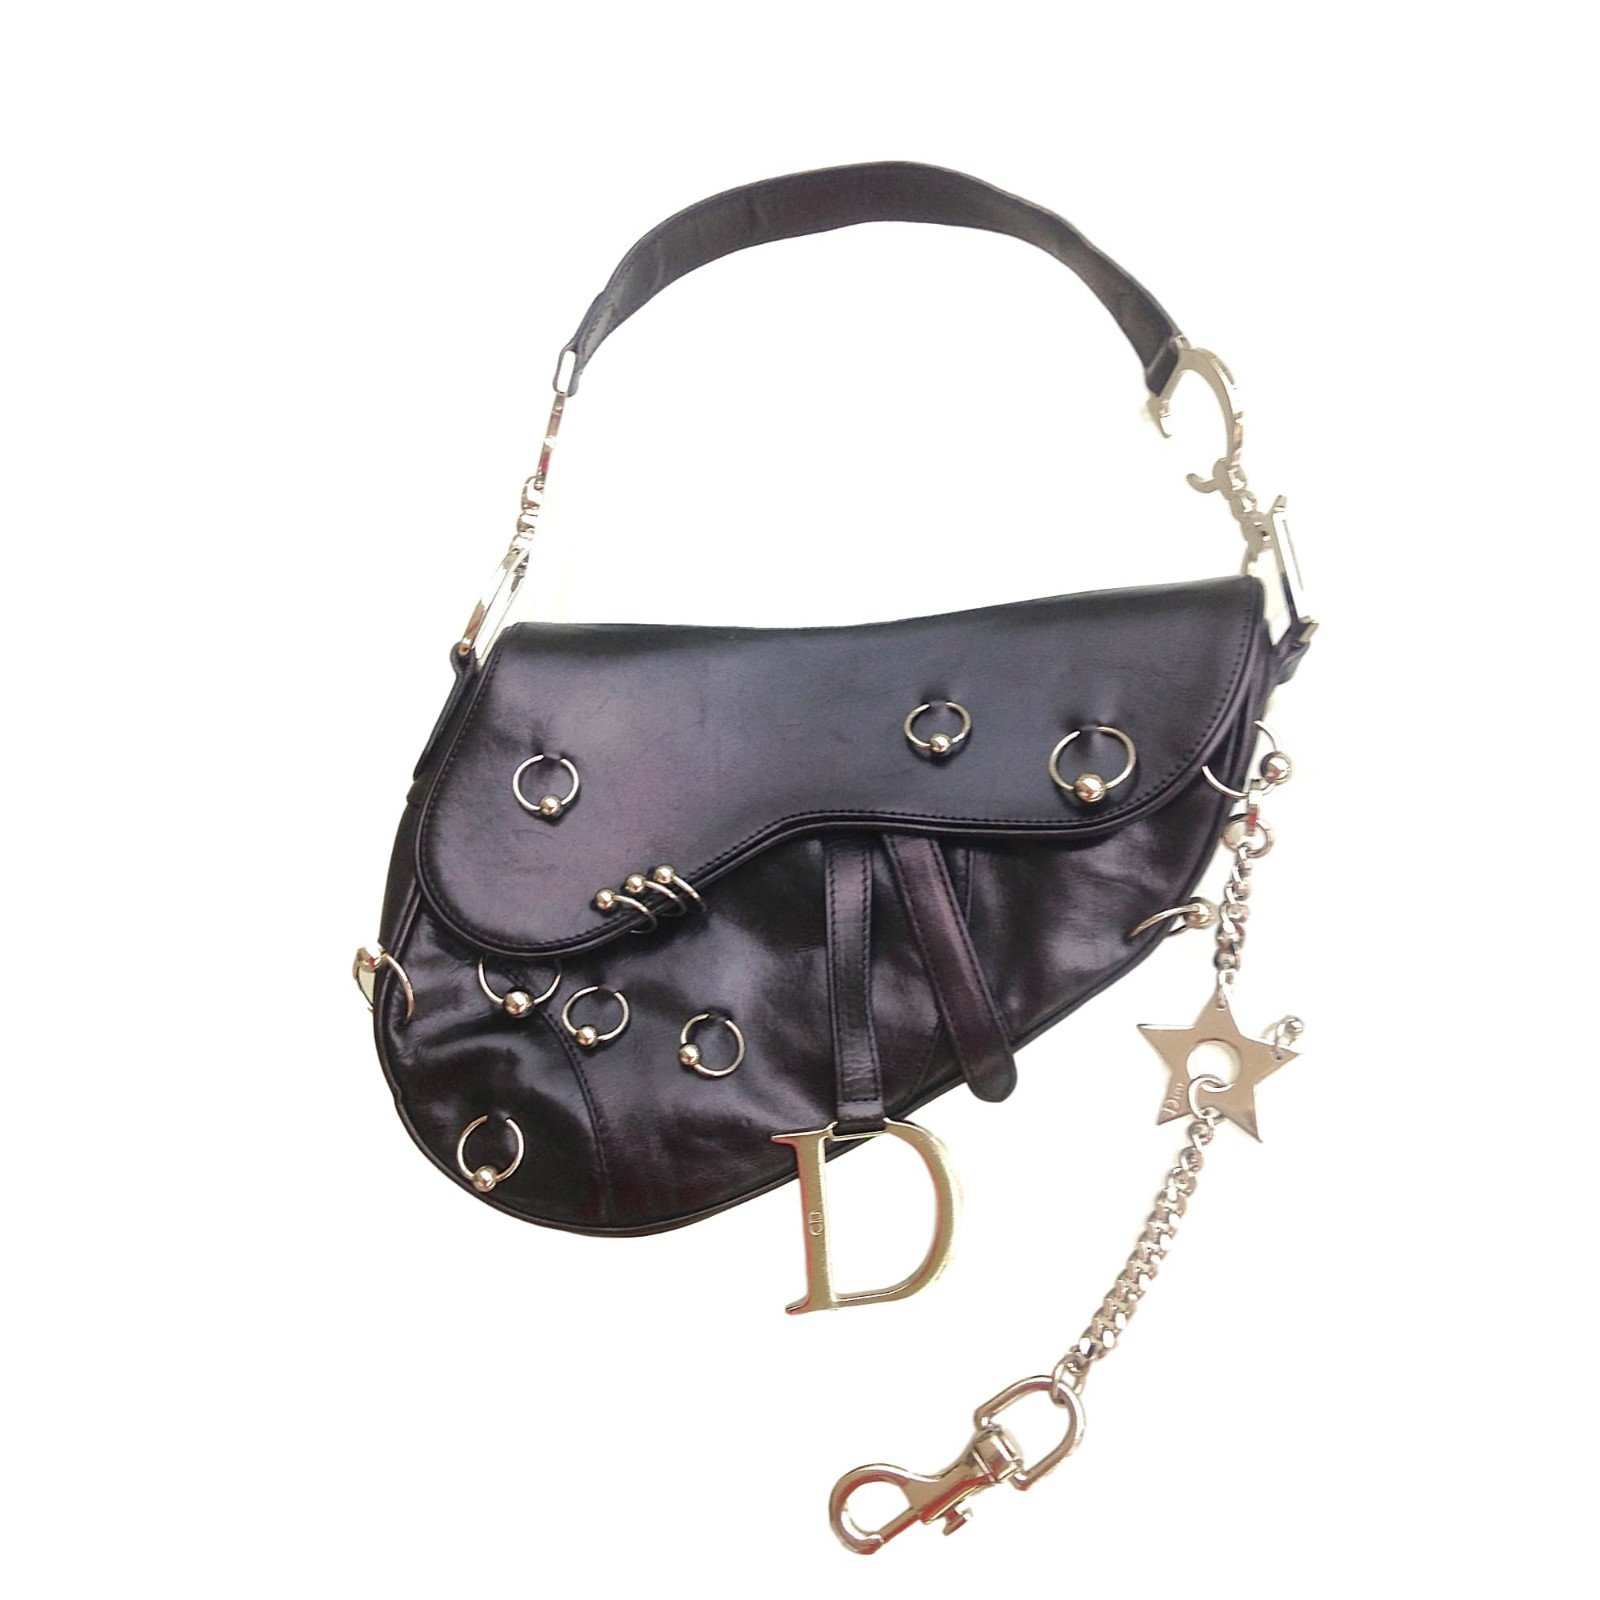 Dior Saddle Handbags Leather Black Ref 41612